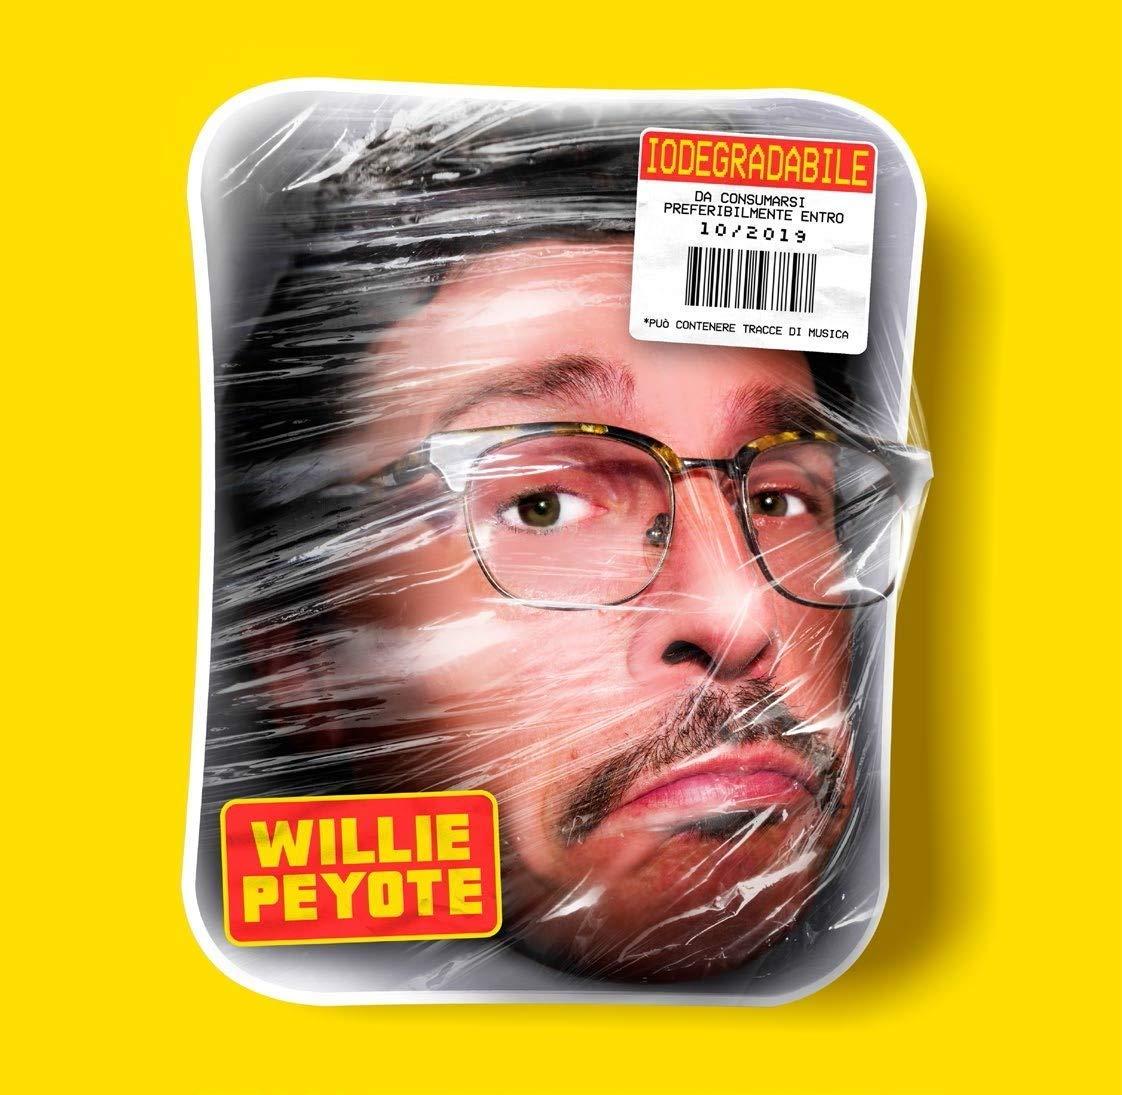 Willie Peyote Iodegradabile copertina disco